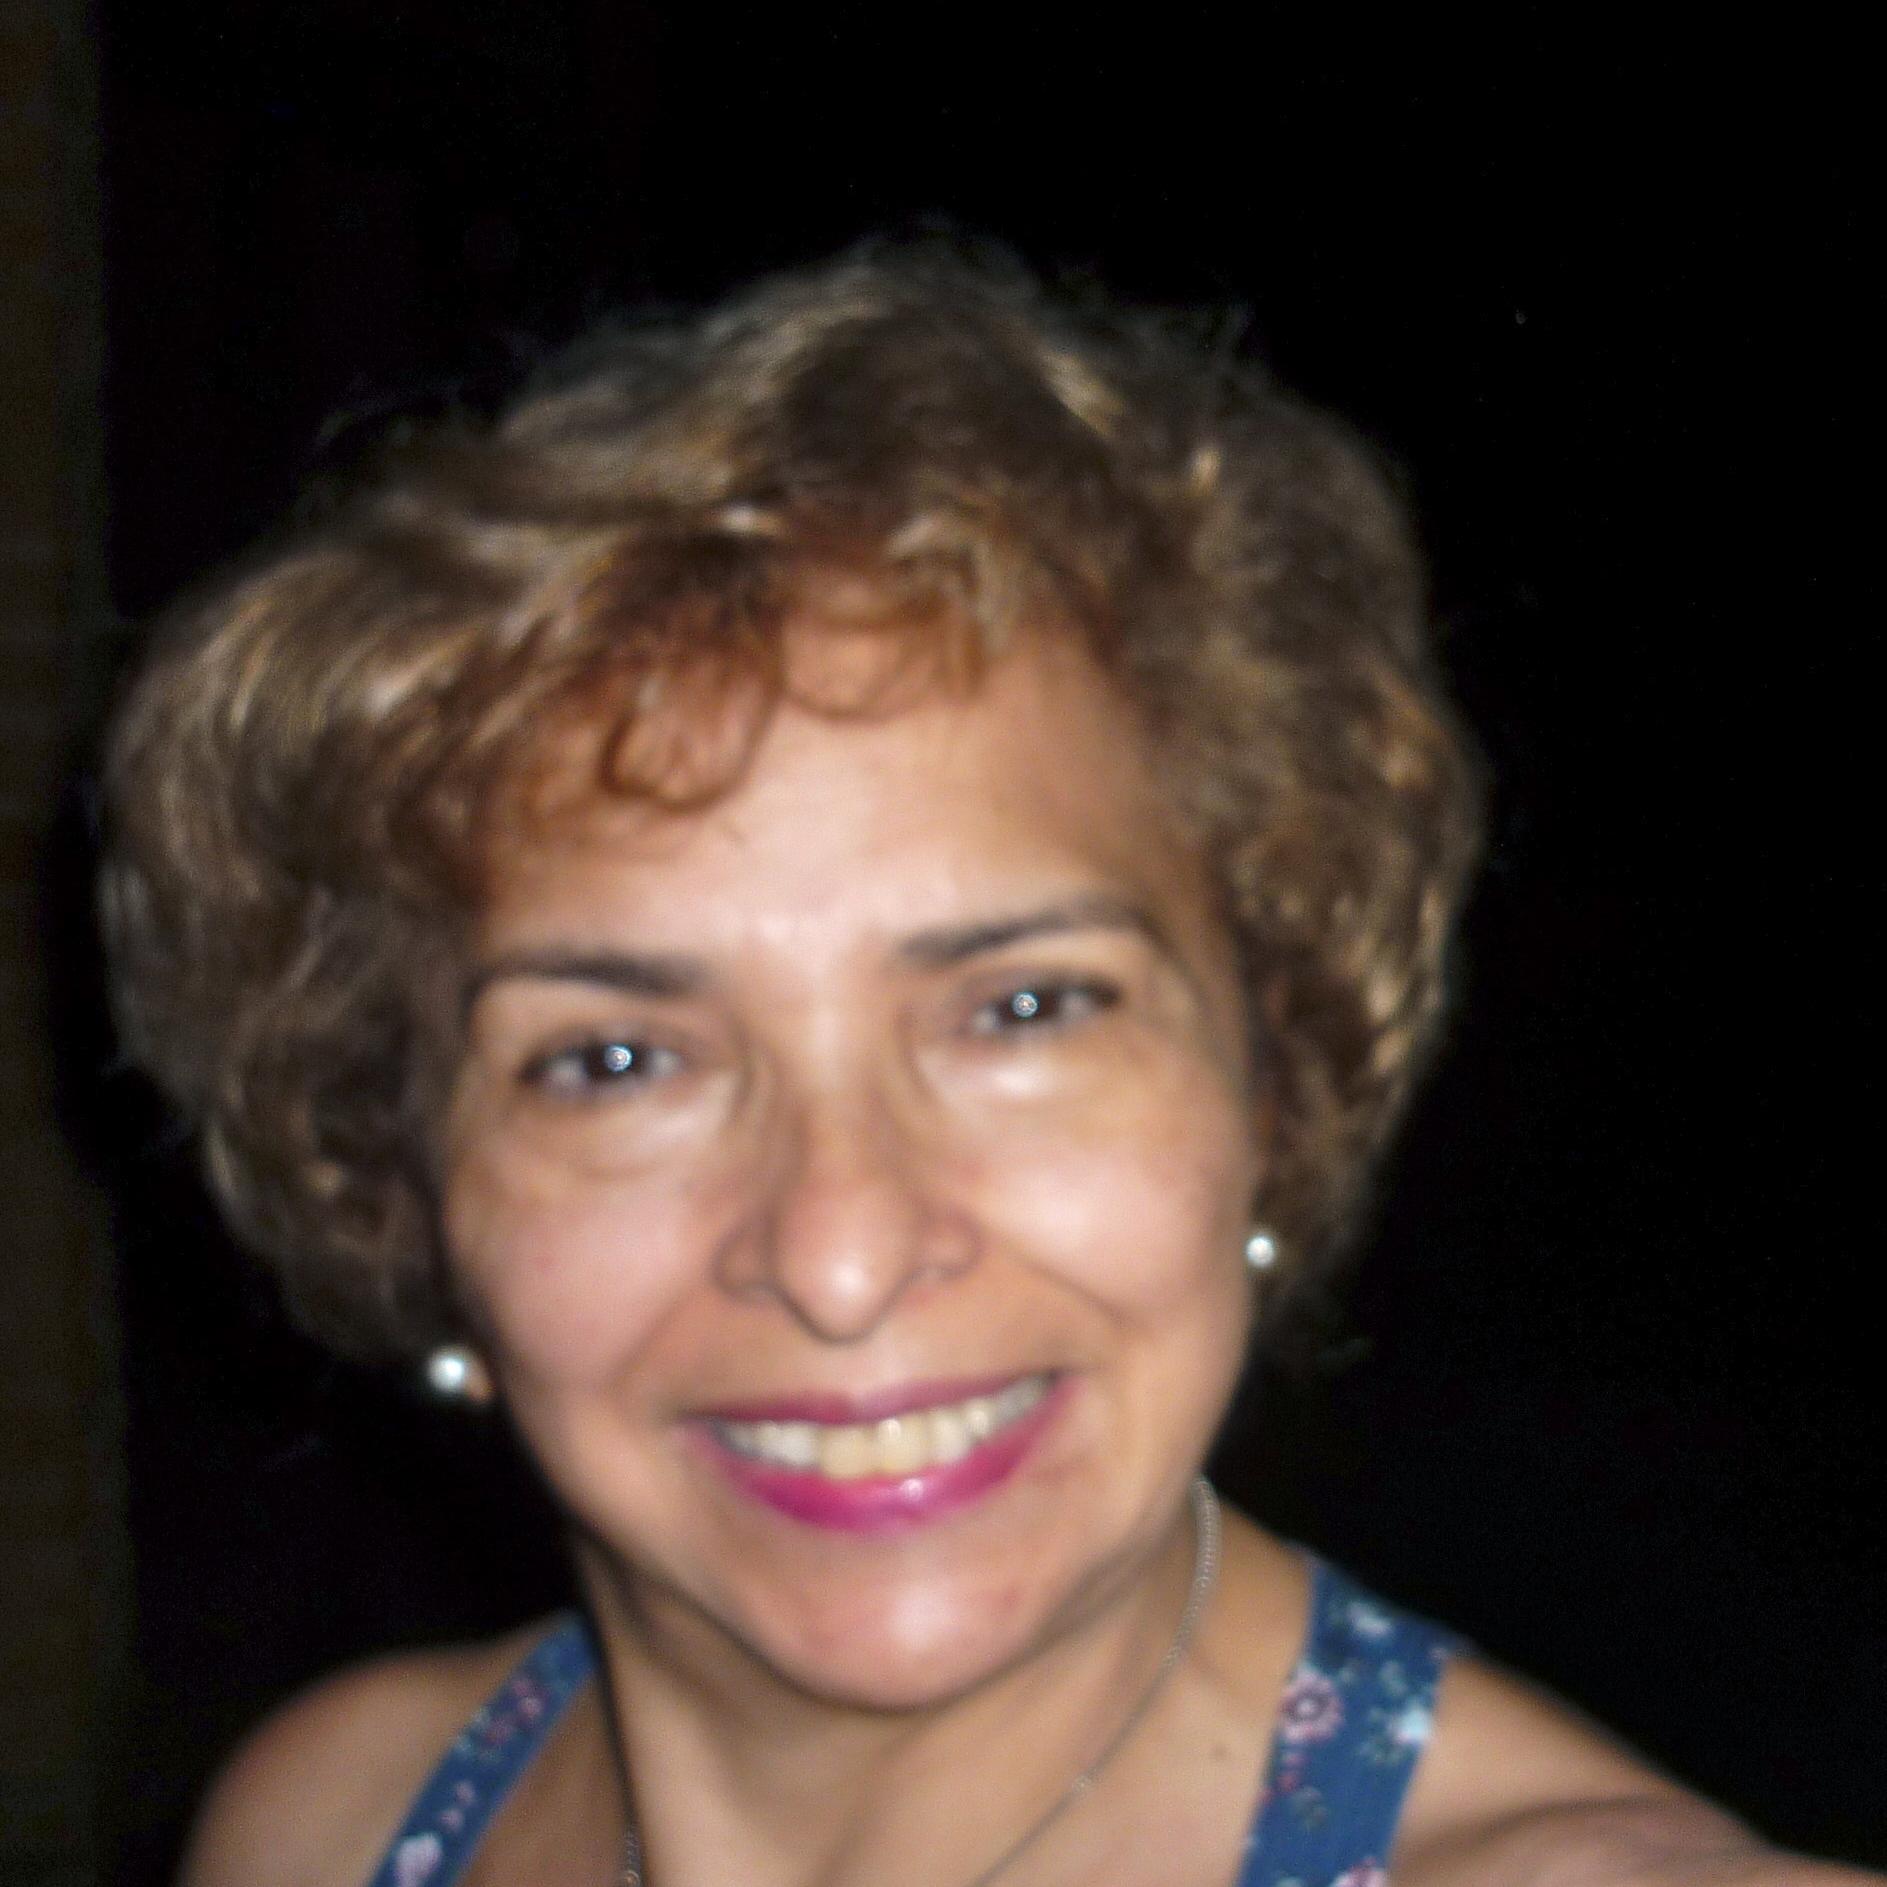 Joana Cosmo Fernandes